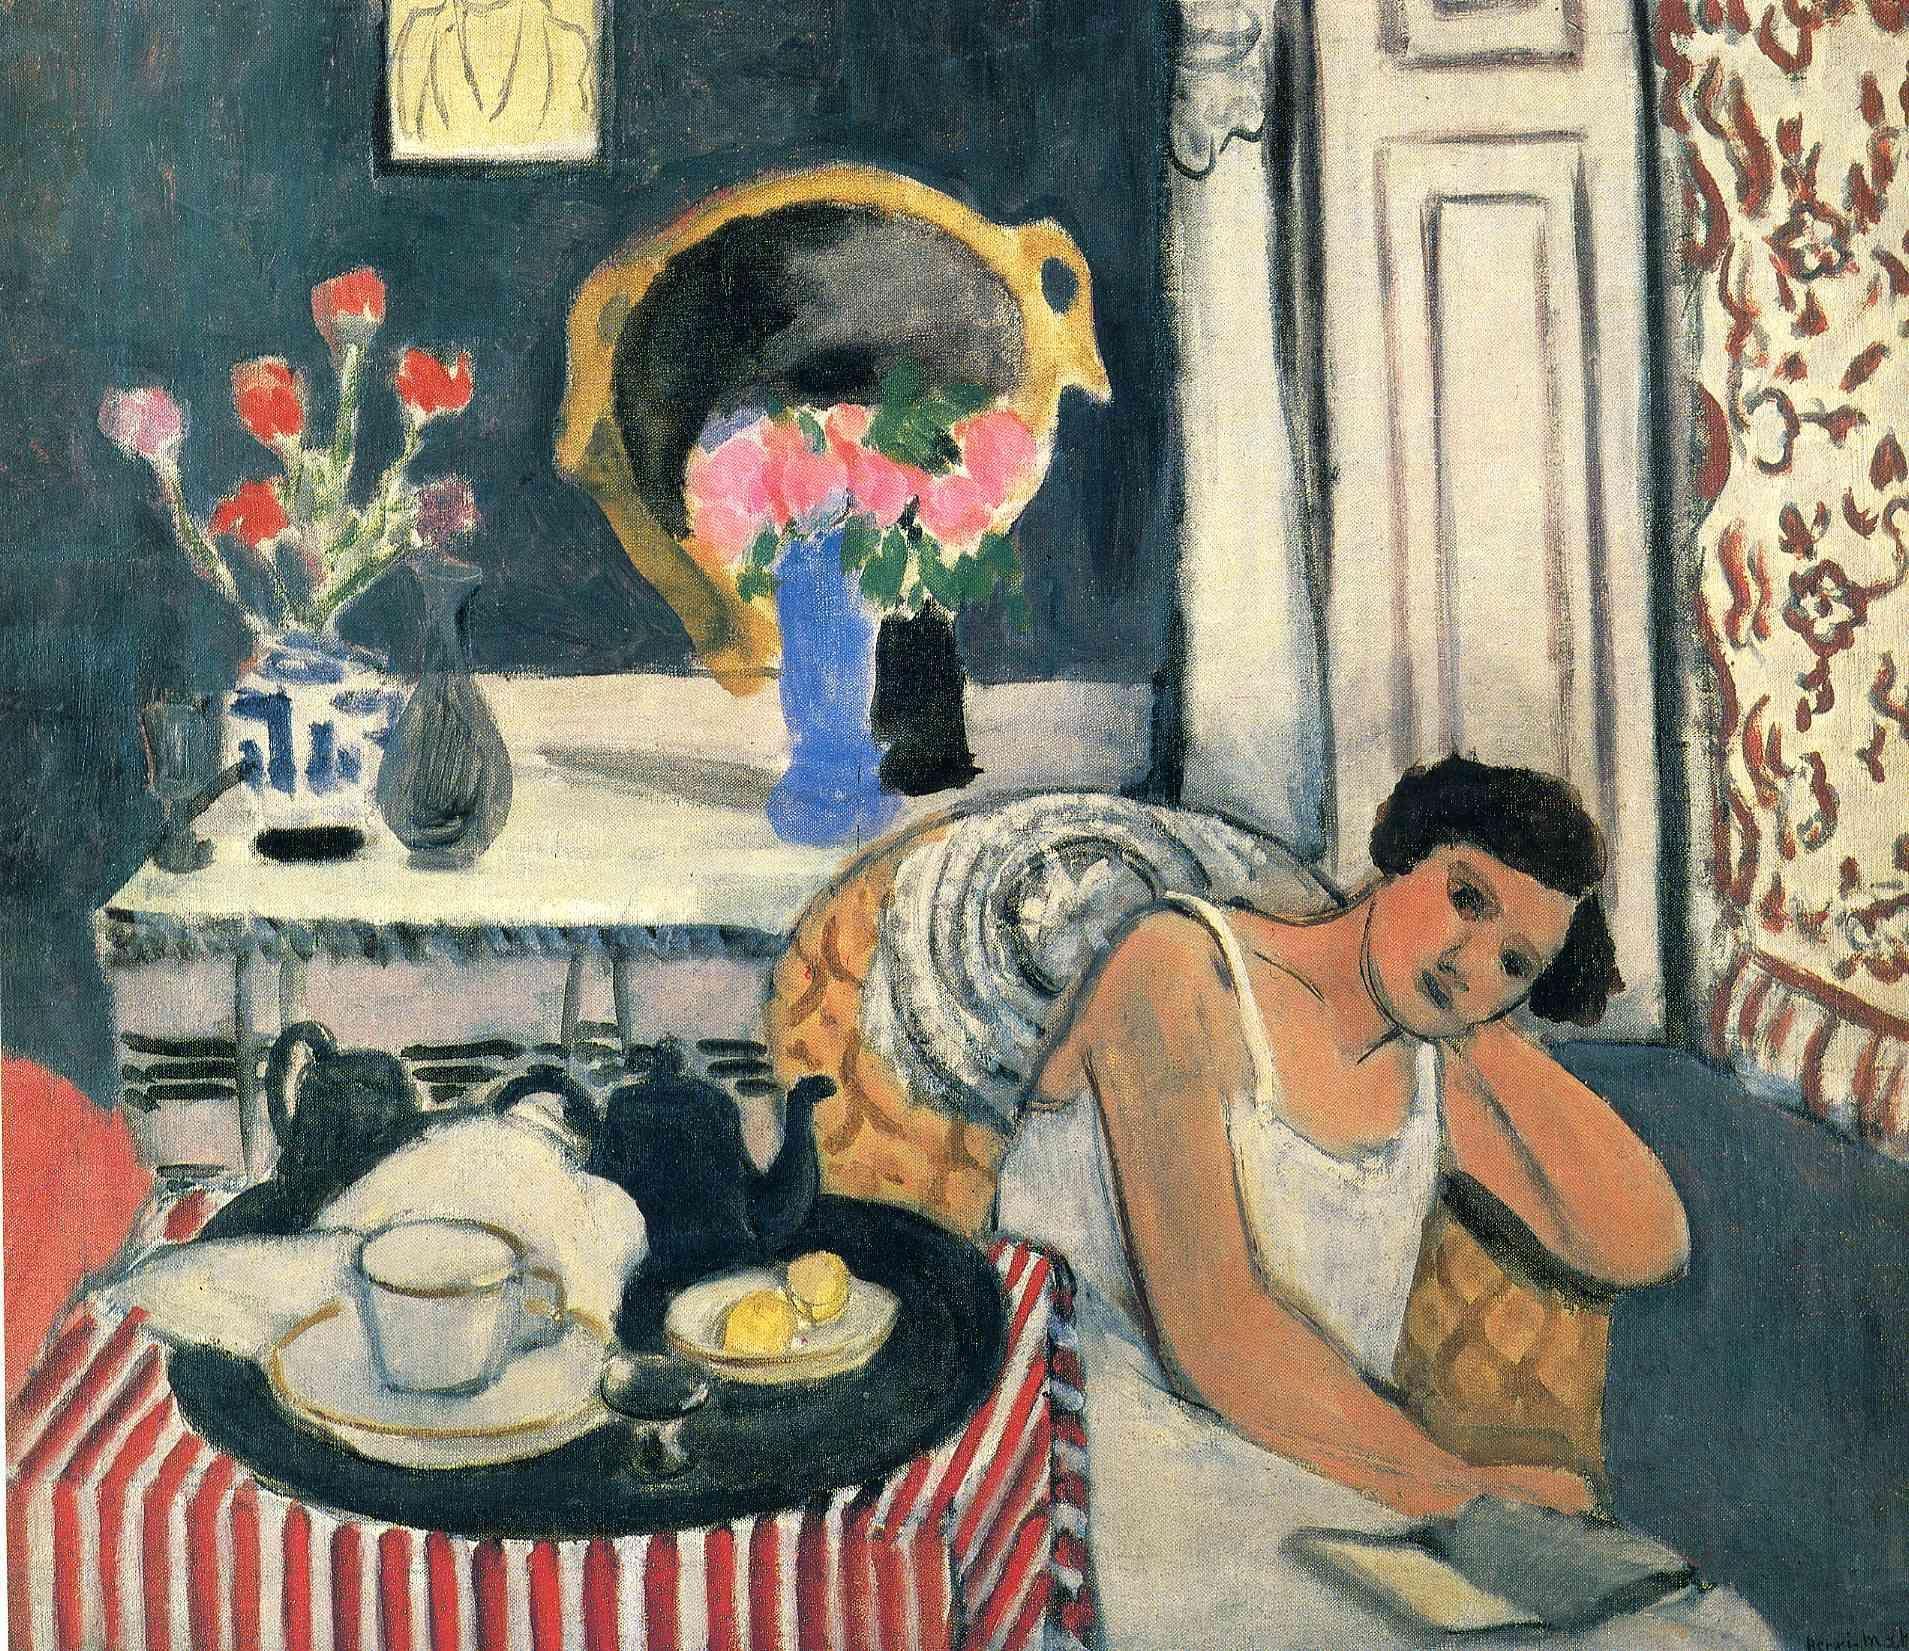 HENRI MATISSE - WOMEN READING | Henri matisse | Pinterest ...